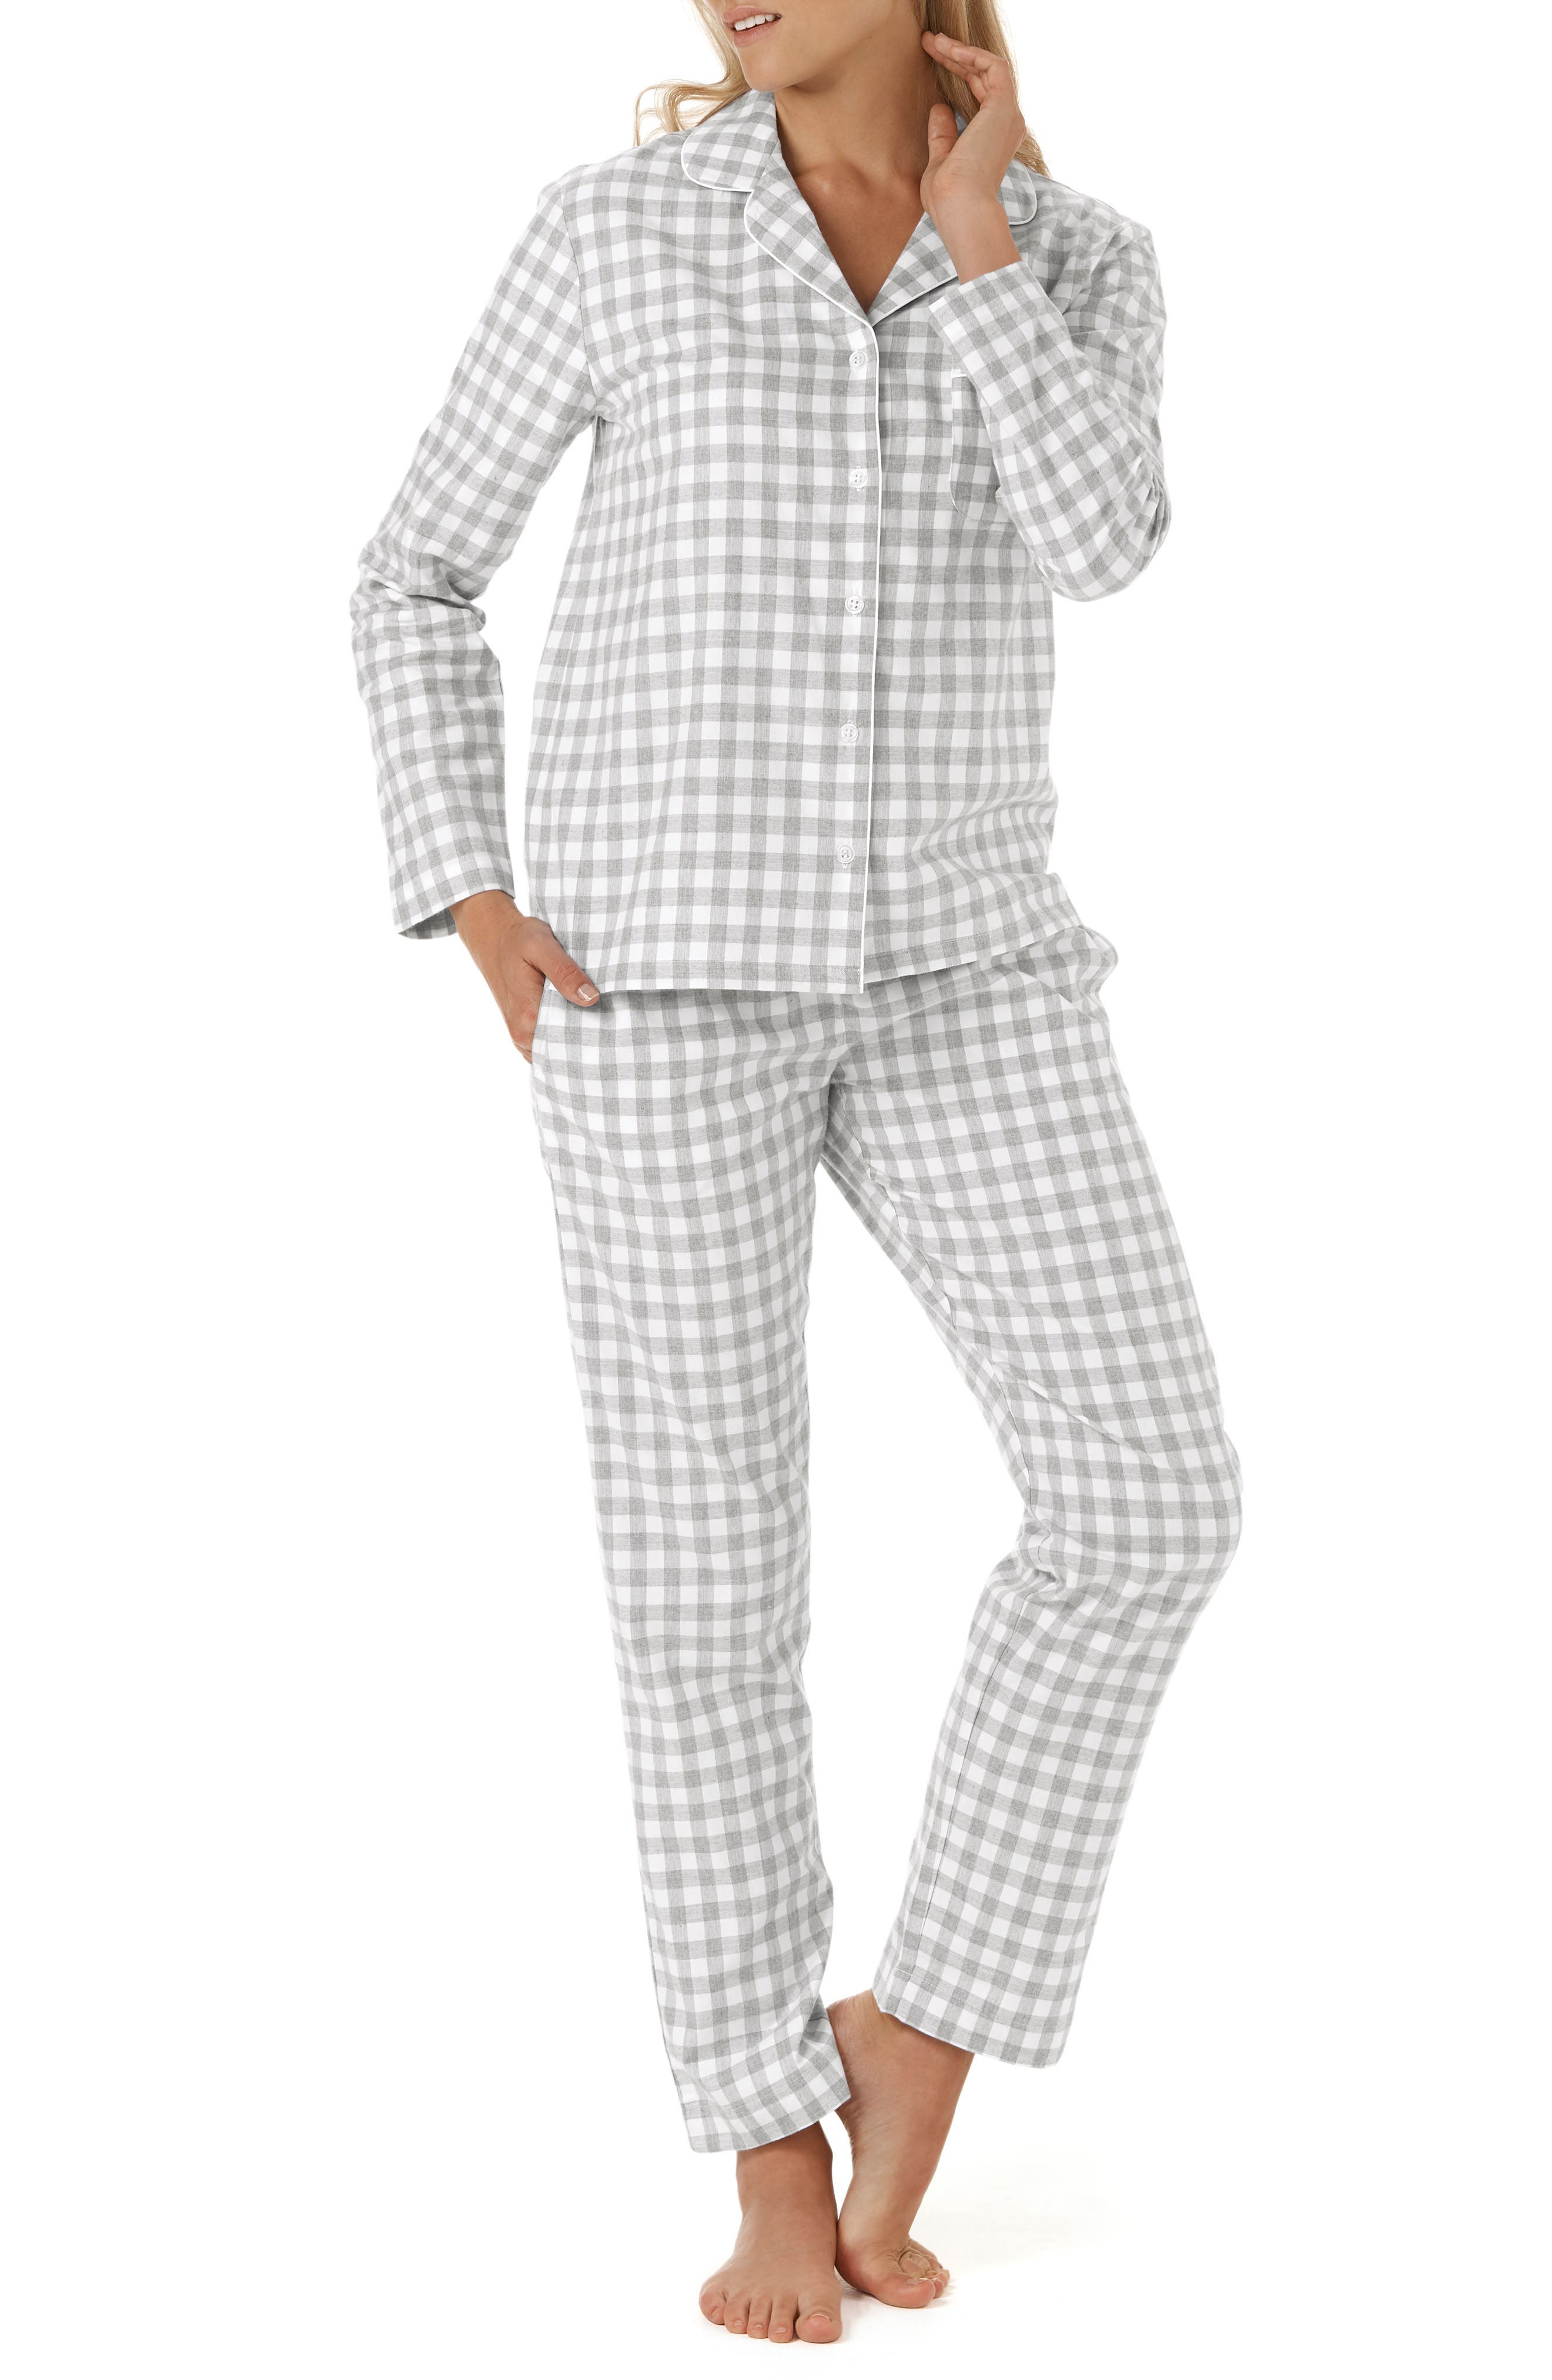 Gingham Check Pajamas,                             Main thumbnail 1, color,                             GREY/ WHITE GINGHAM